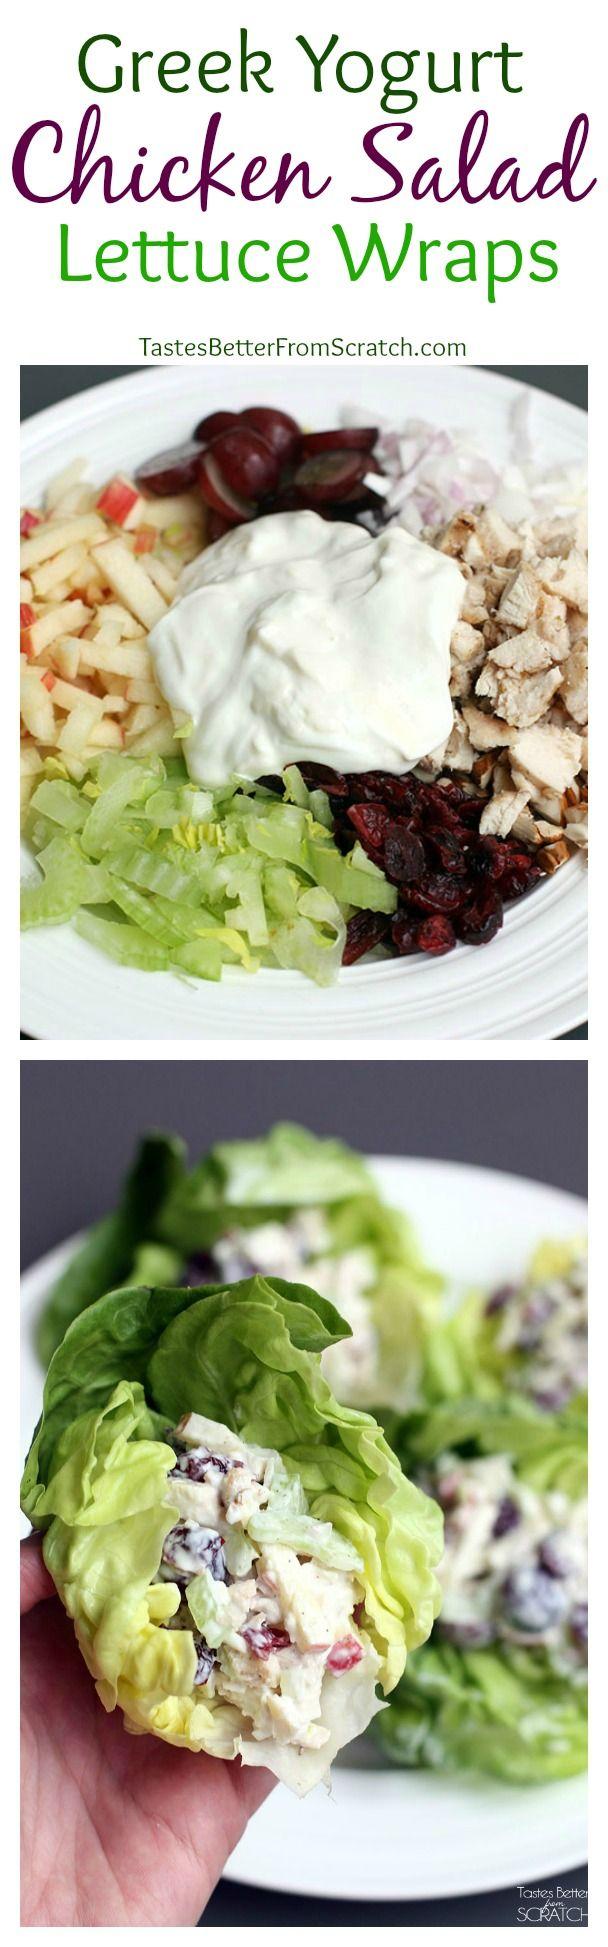 ♨ Greek Yogurt Chicken Salad Lettuce Wraps